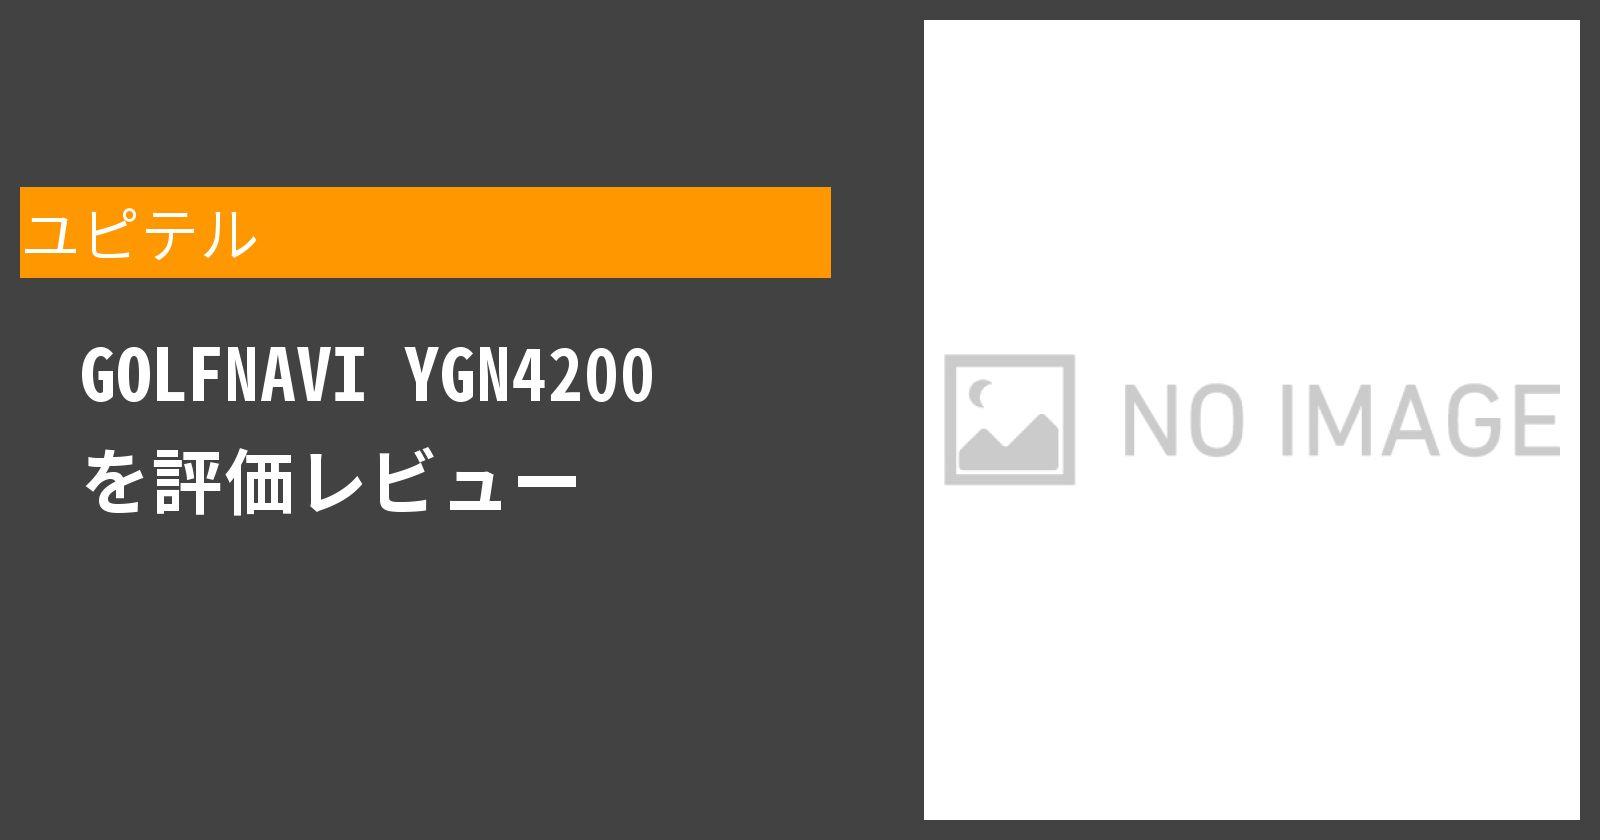 GOLFNAVI YGN4200を徹底評価